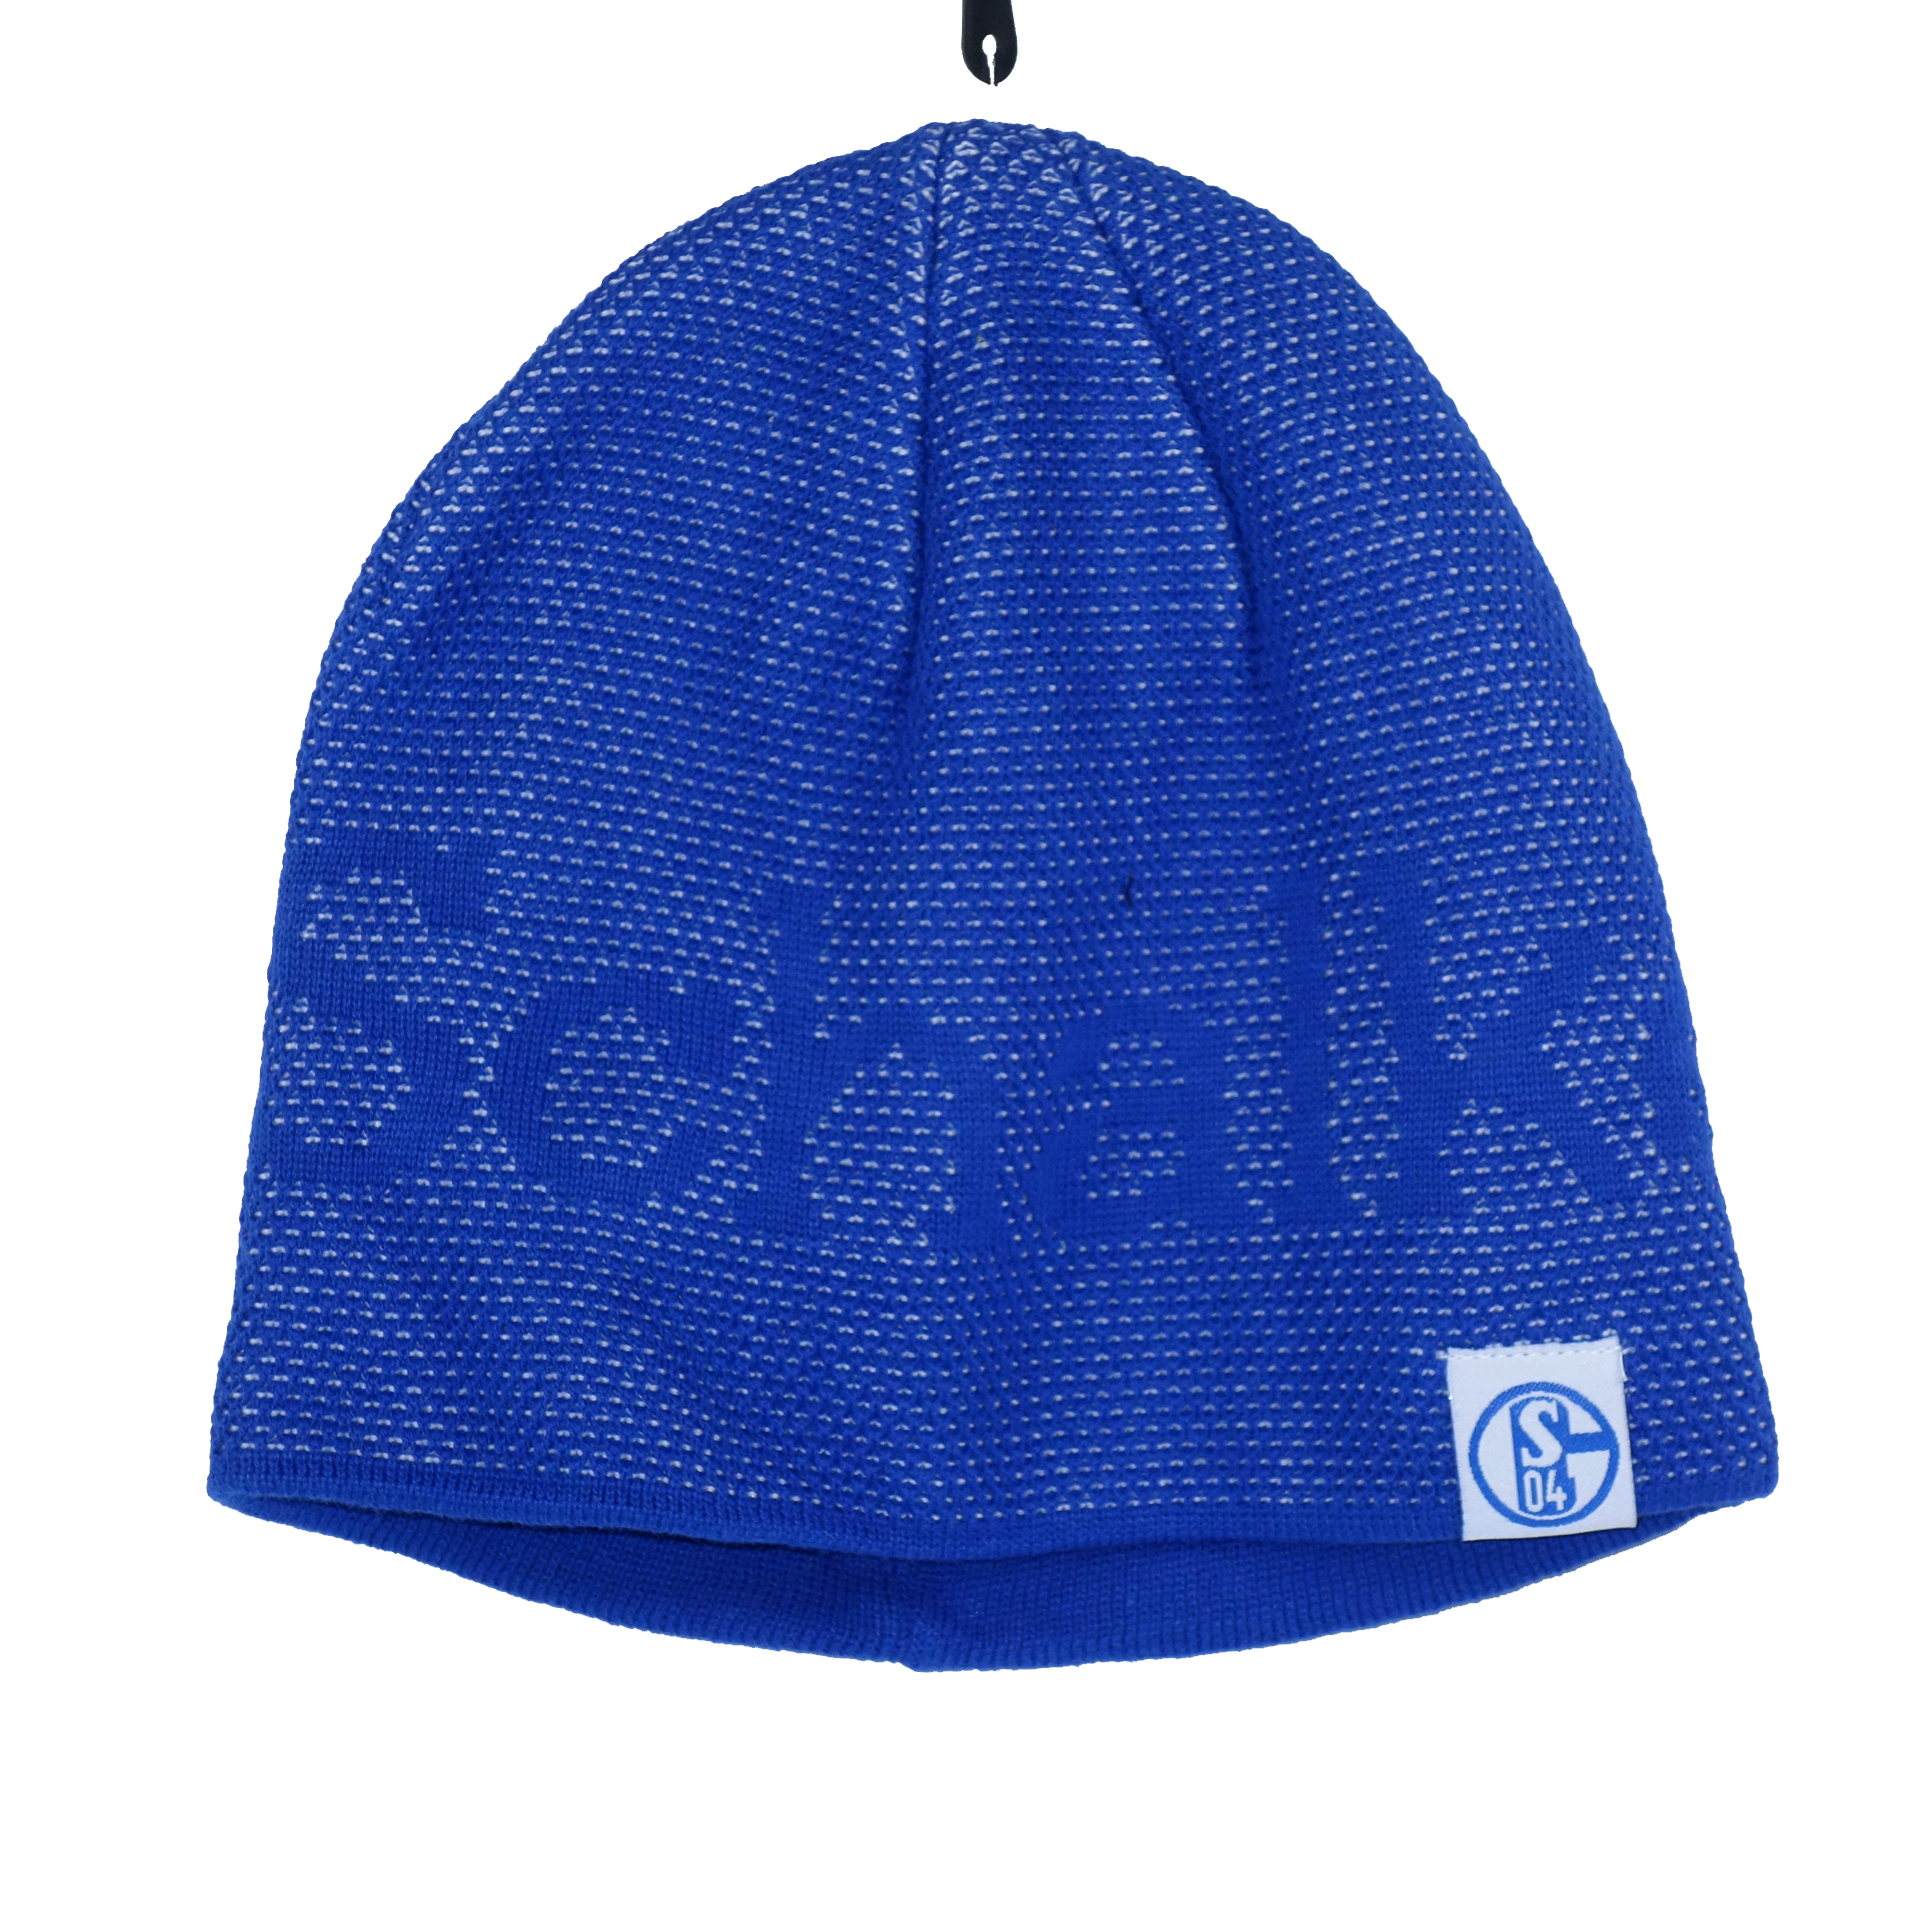 Schalke 04 Wintermütze Königsblau